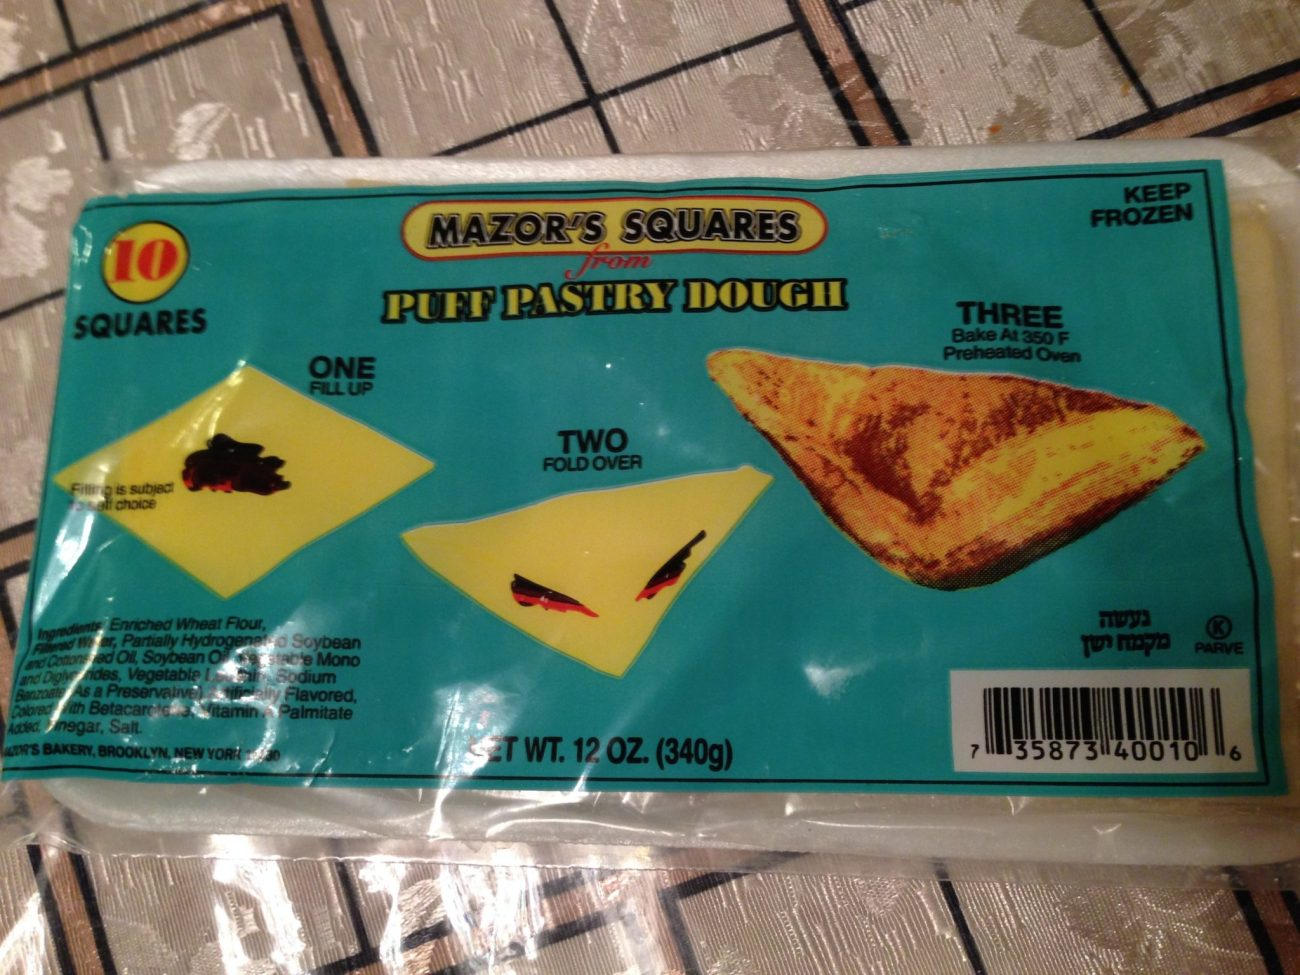 Mazor's Squares Puff Pastry Dough for Piroshki Making